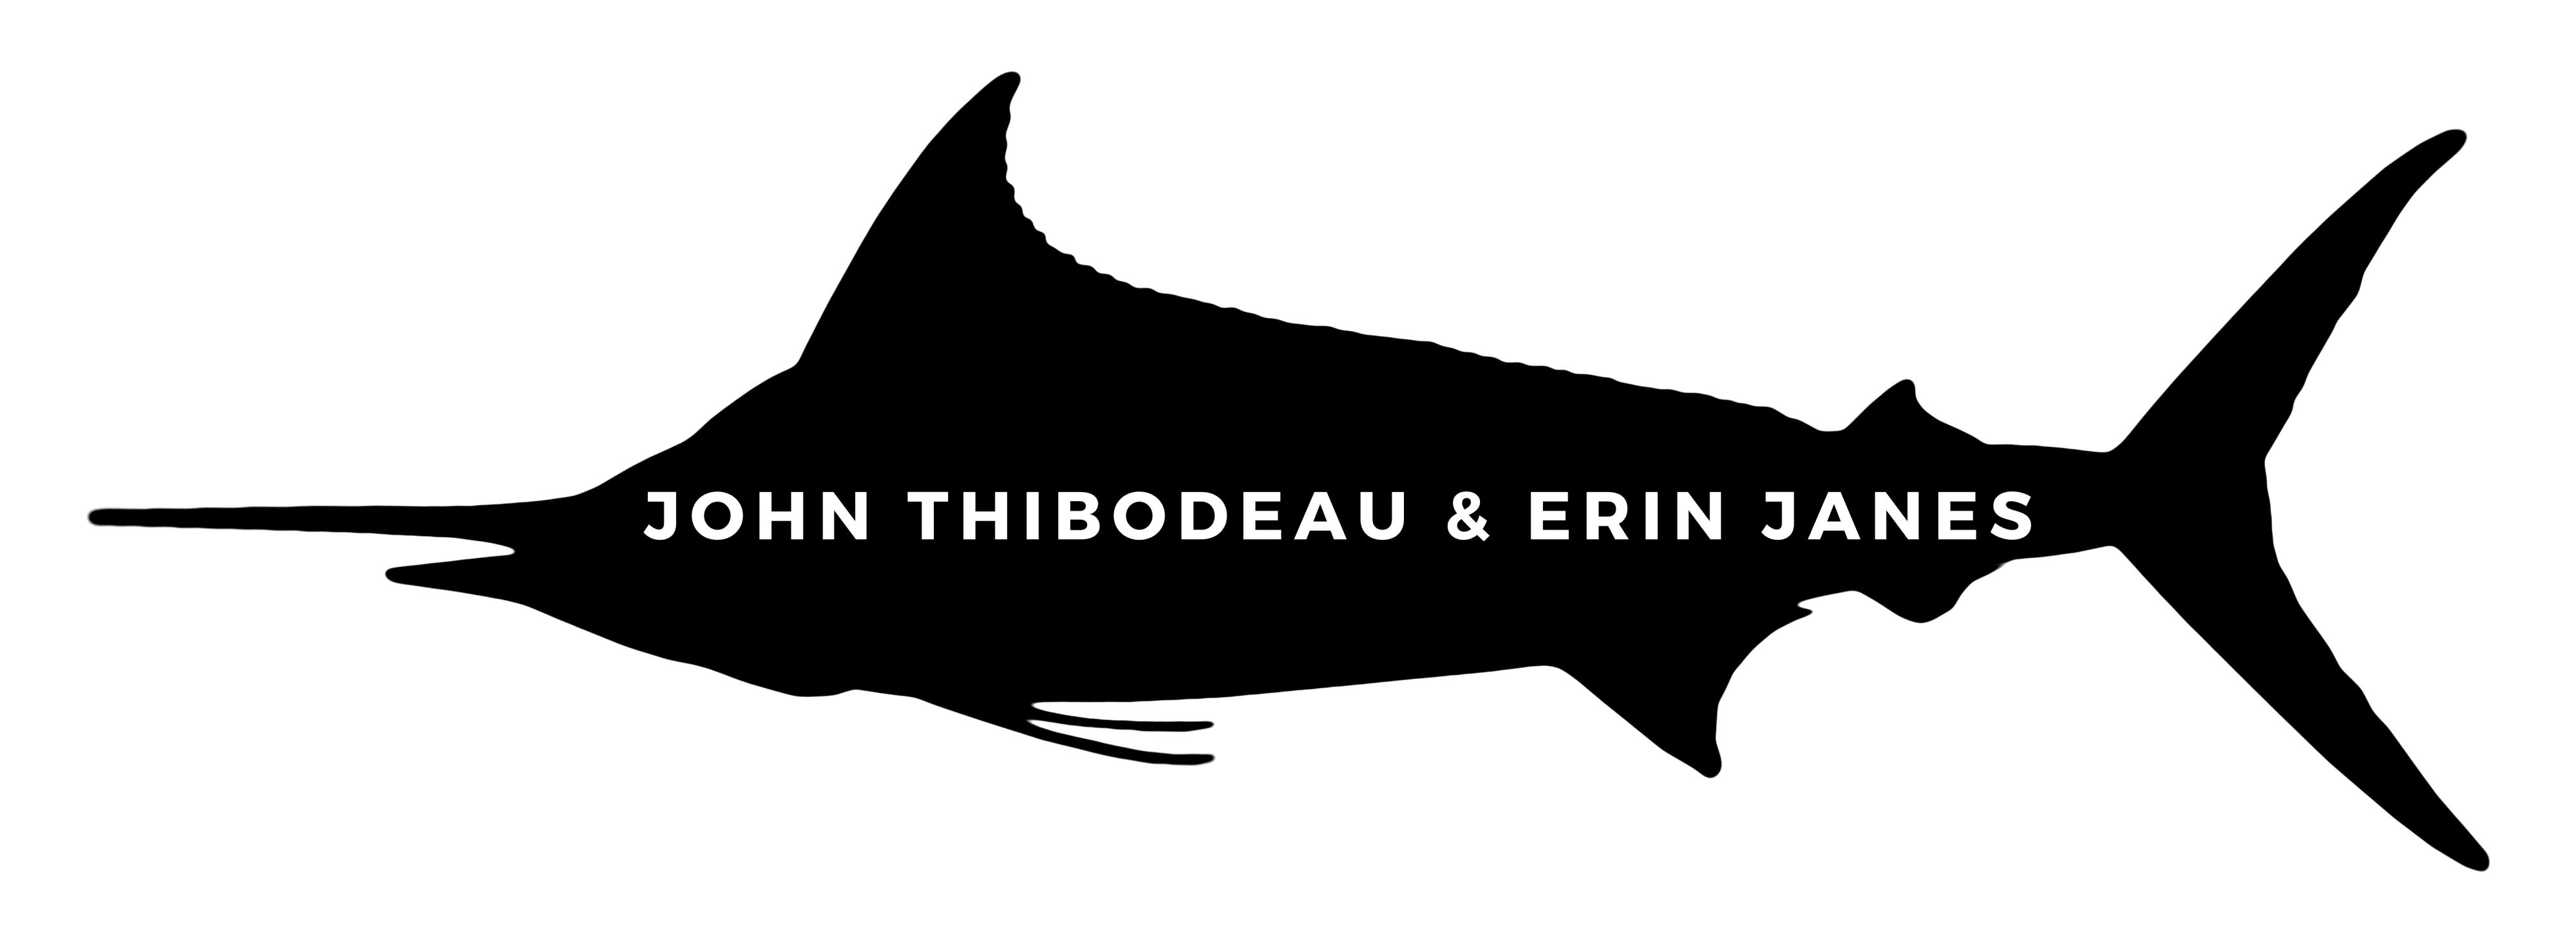 Broadbill Bash Sponsors John Thibodeau & Erin Janes